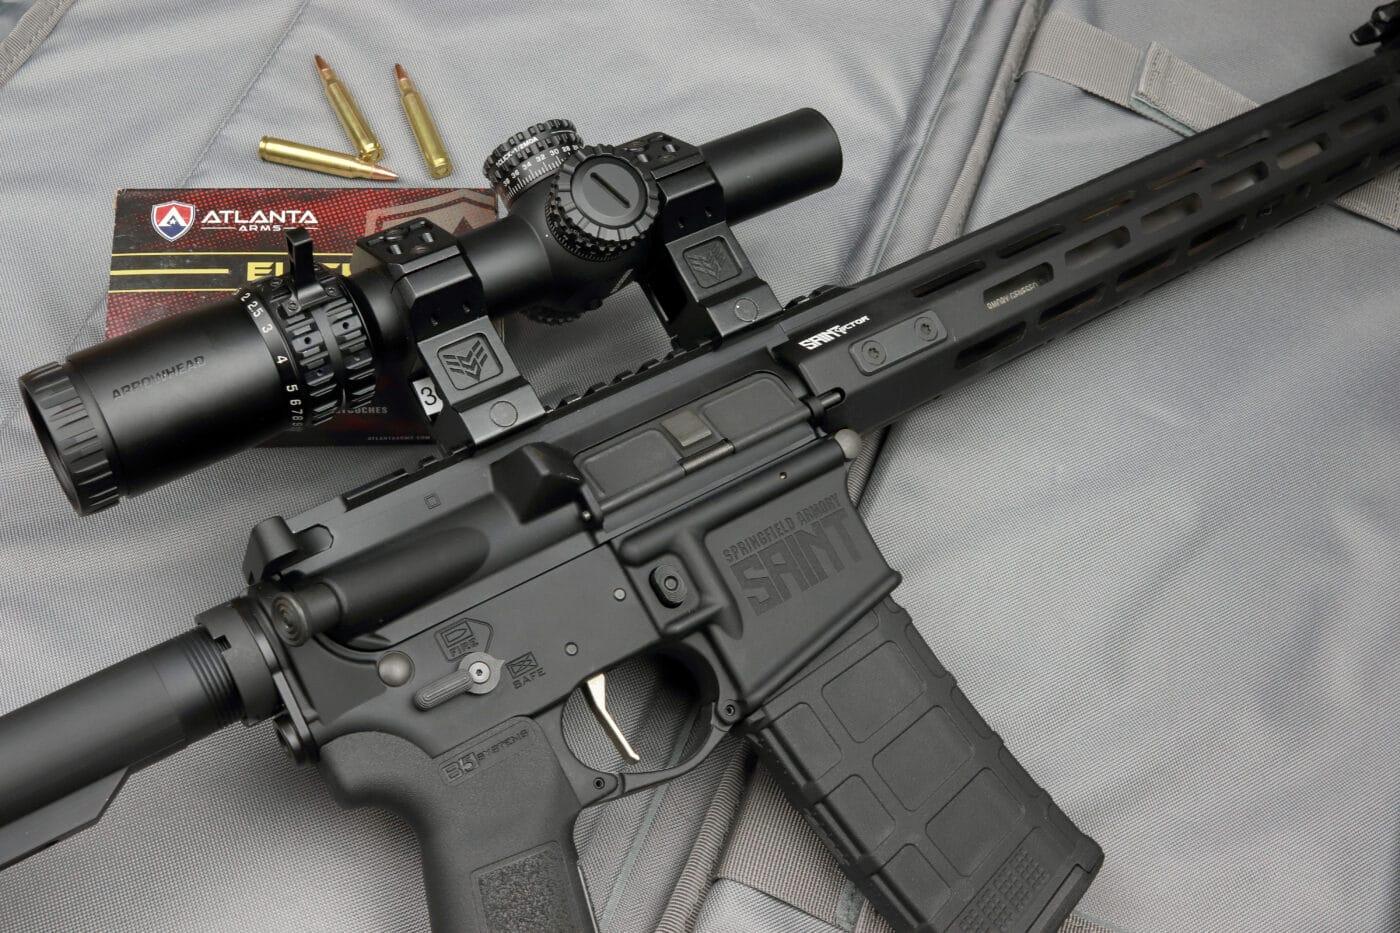 Atlanta Arms ammo used in testing